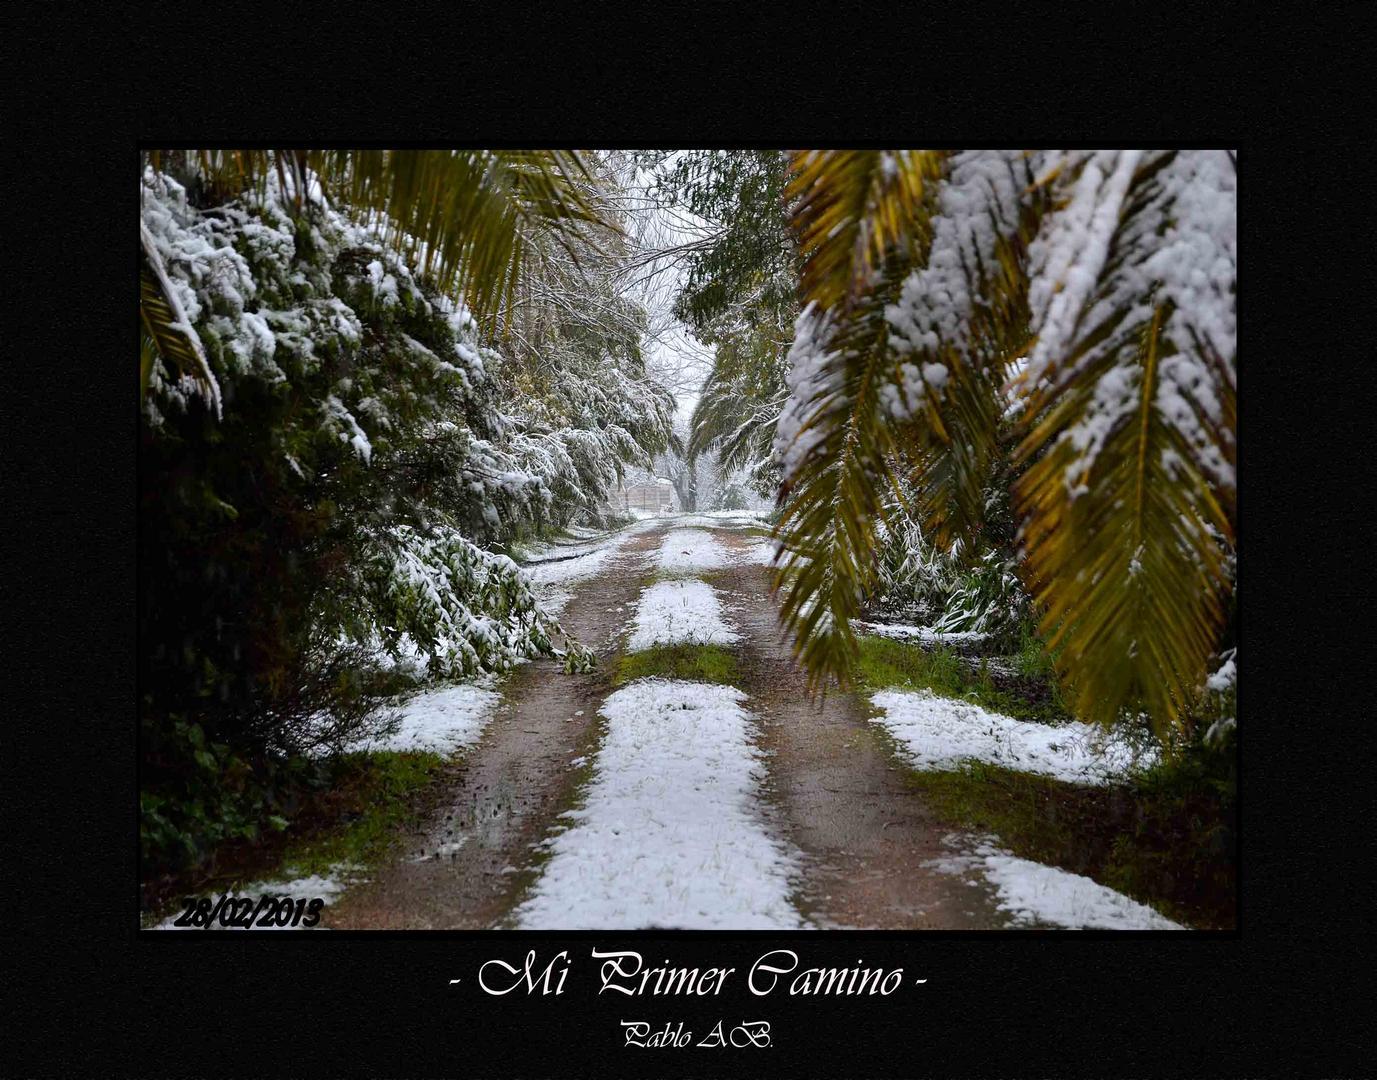 - Mi Primer Camino -